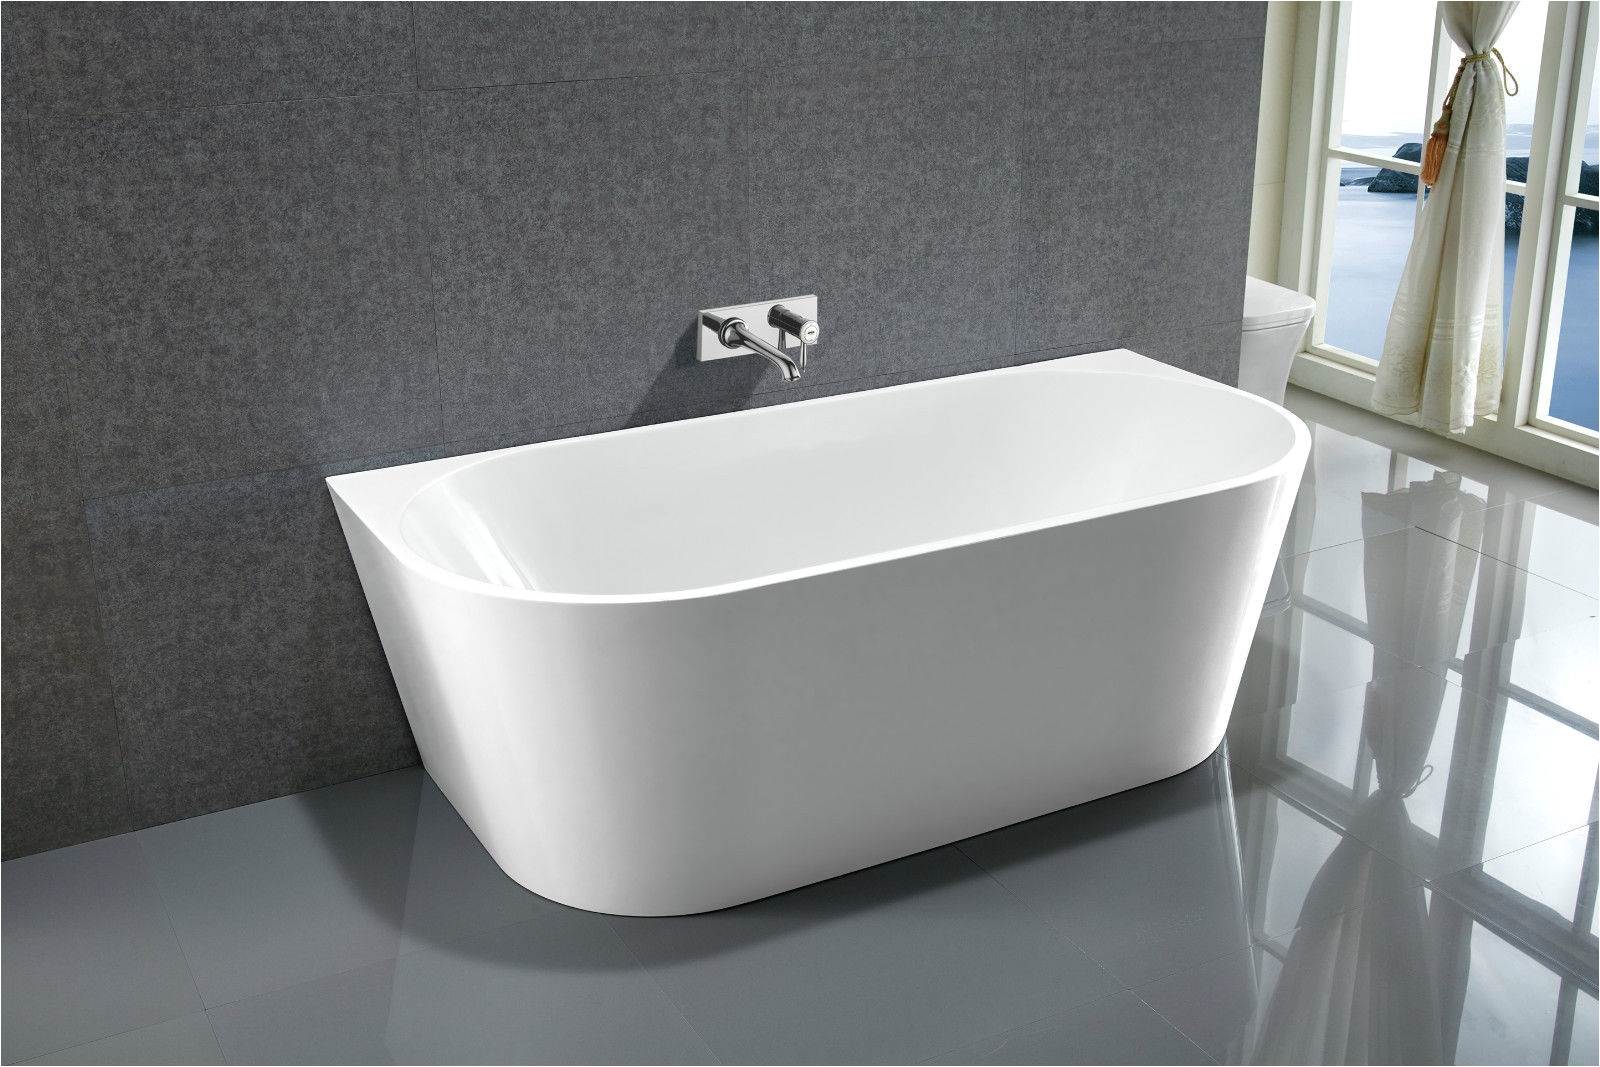 Freestanding Bathtub Sydney Le Rond